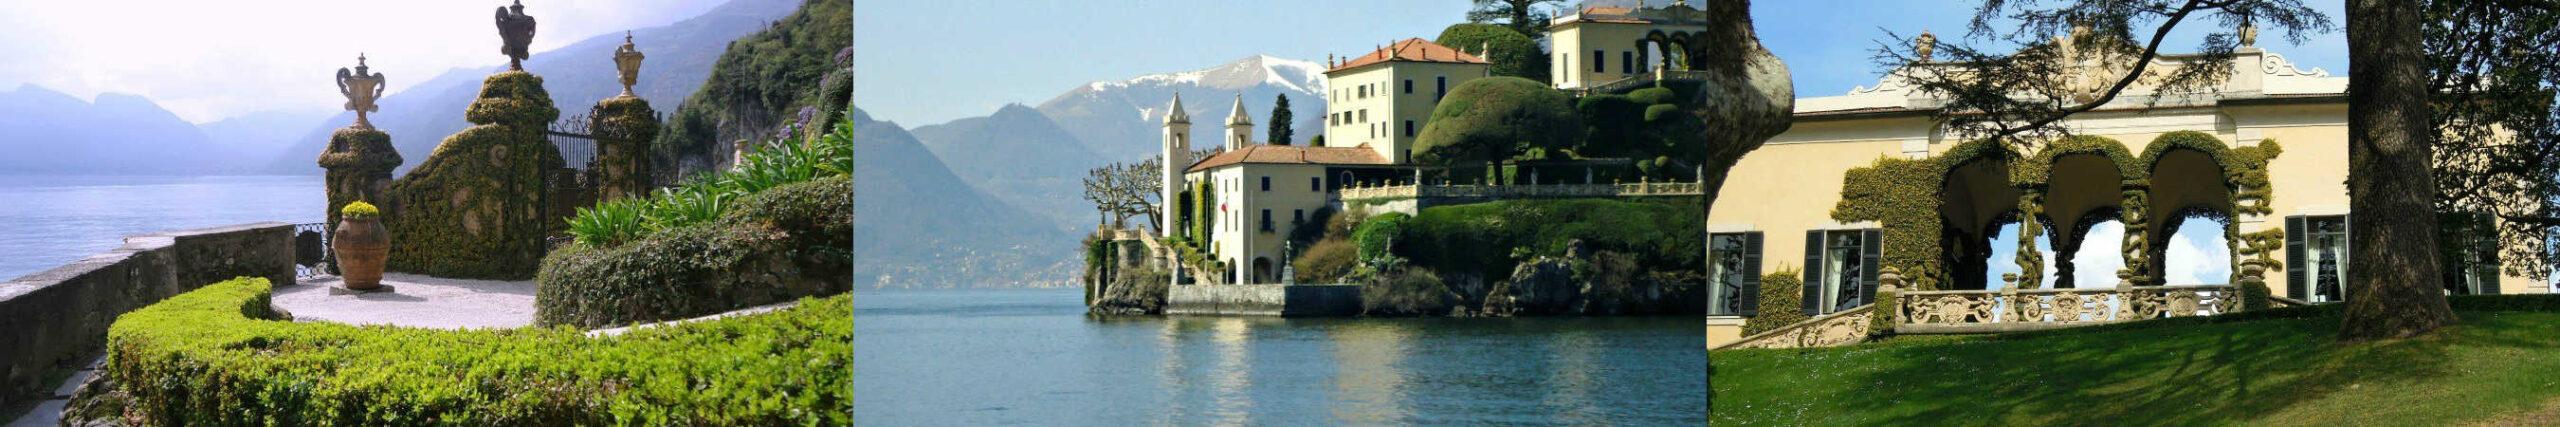 Villa del Balbianello Photos